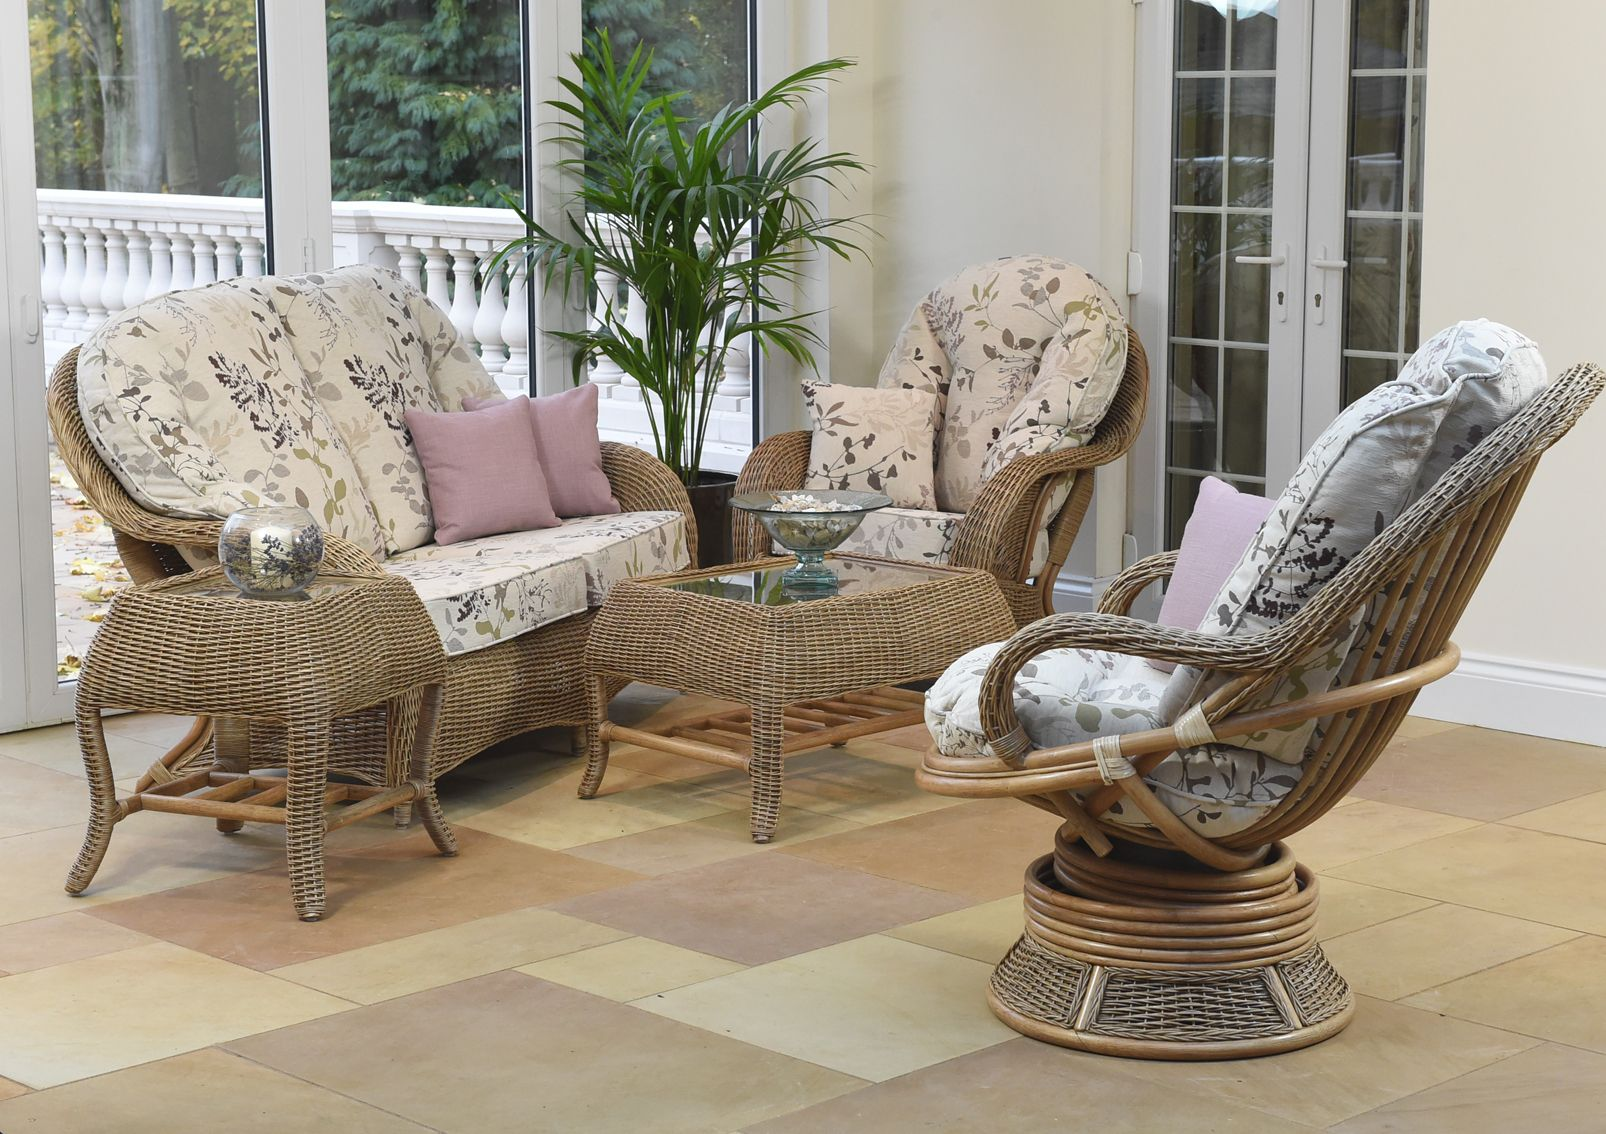 Daro Cane Furniture, Rattan Furniture, Wicker Furniture, , Conservatory Furniture Leaders in Cane Furniture, Rattan Furniture - Wexford Lounging